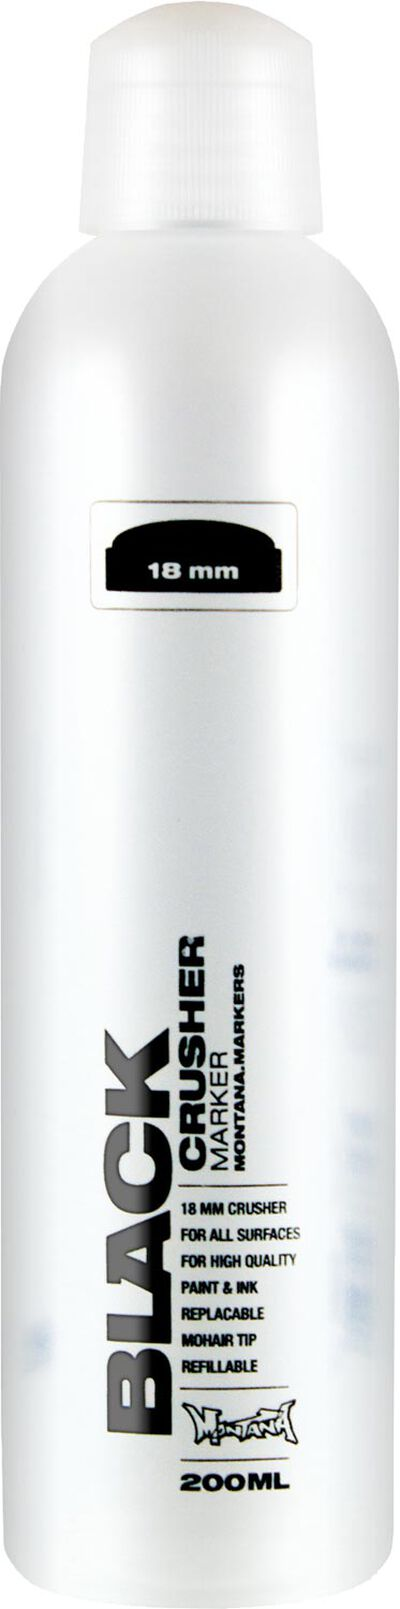 Black 200 ml 18 mm Crusher